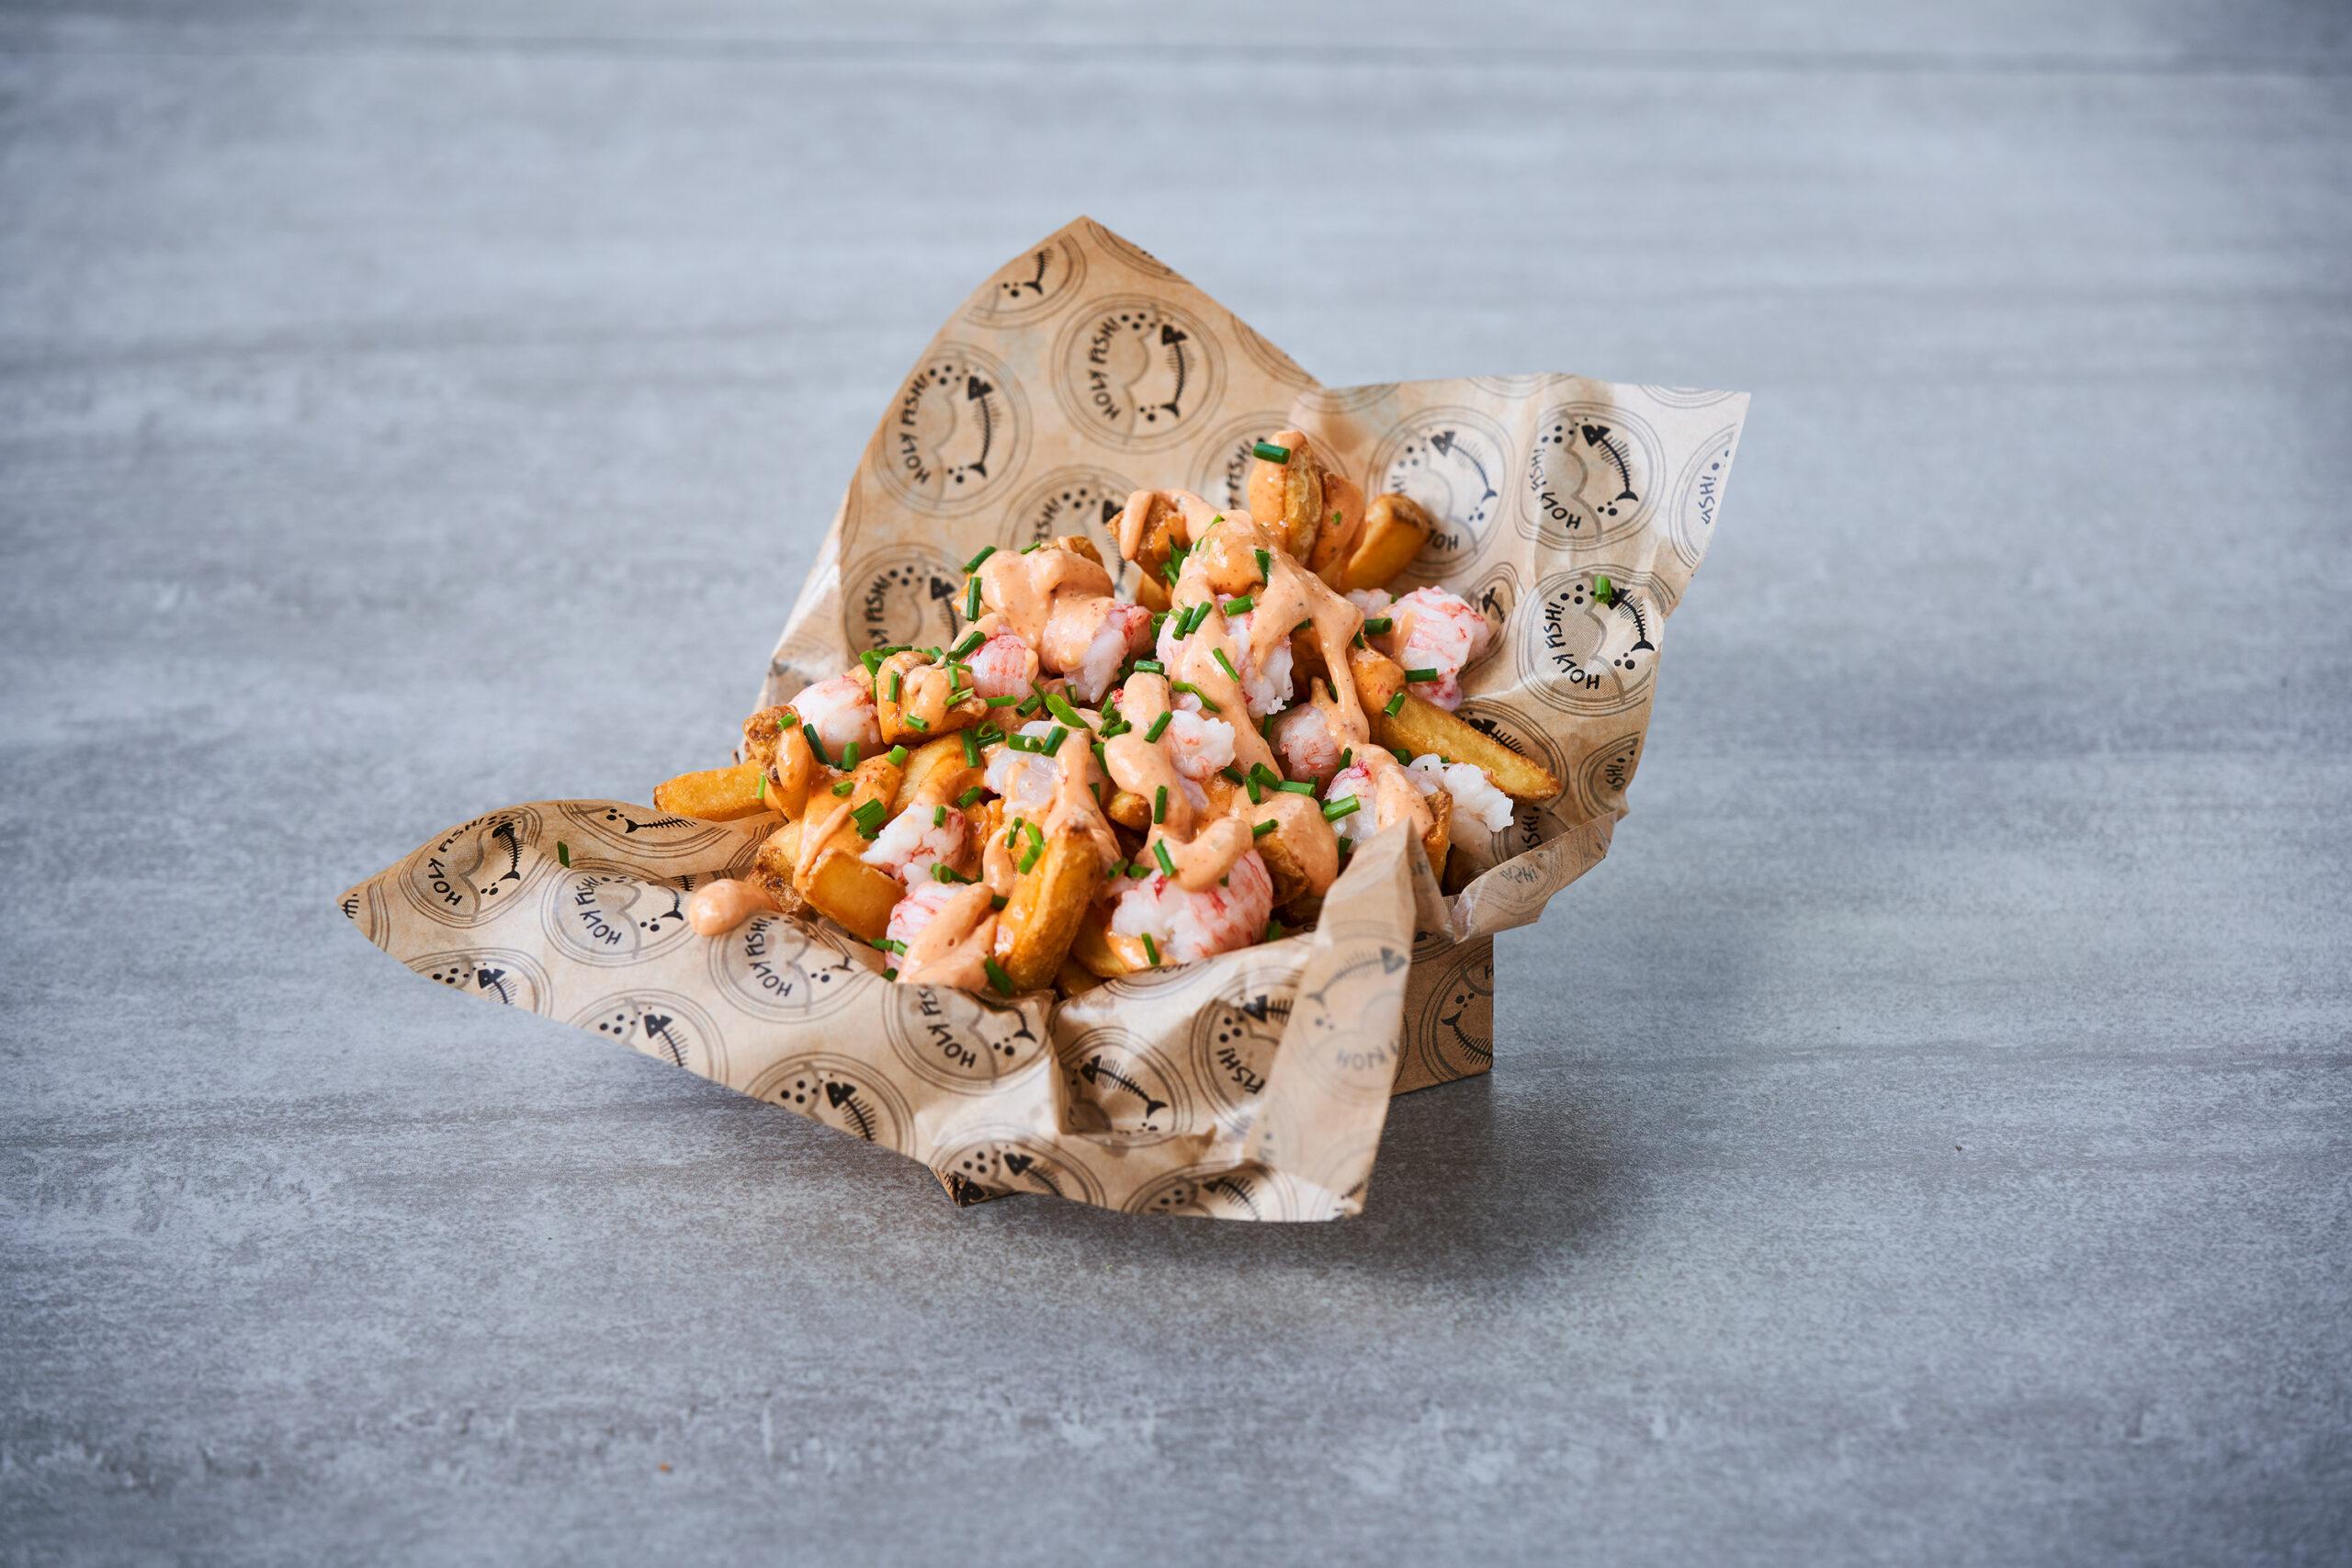 Loaded Lobster Fries